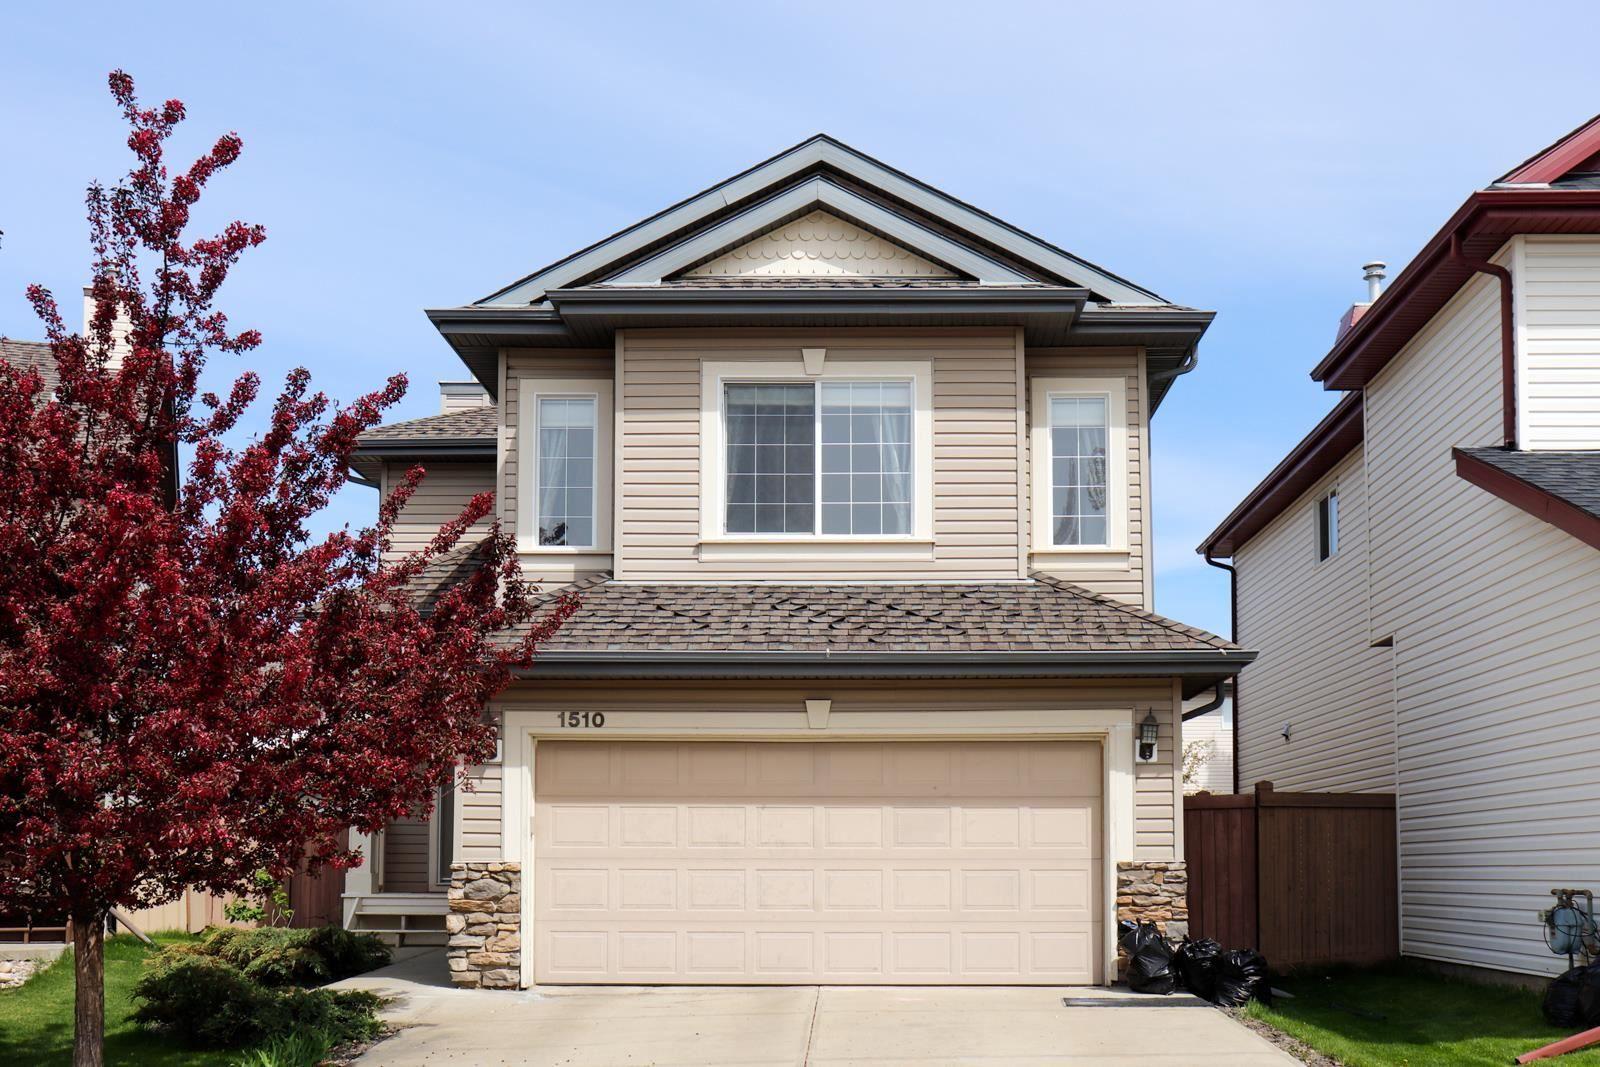 Main Photo: 1510 HODGSON Close in Edmonton: Zone 14 House for sale : MLS®# E4246398